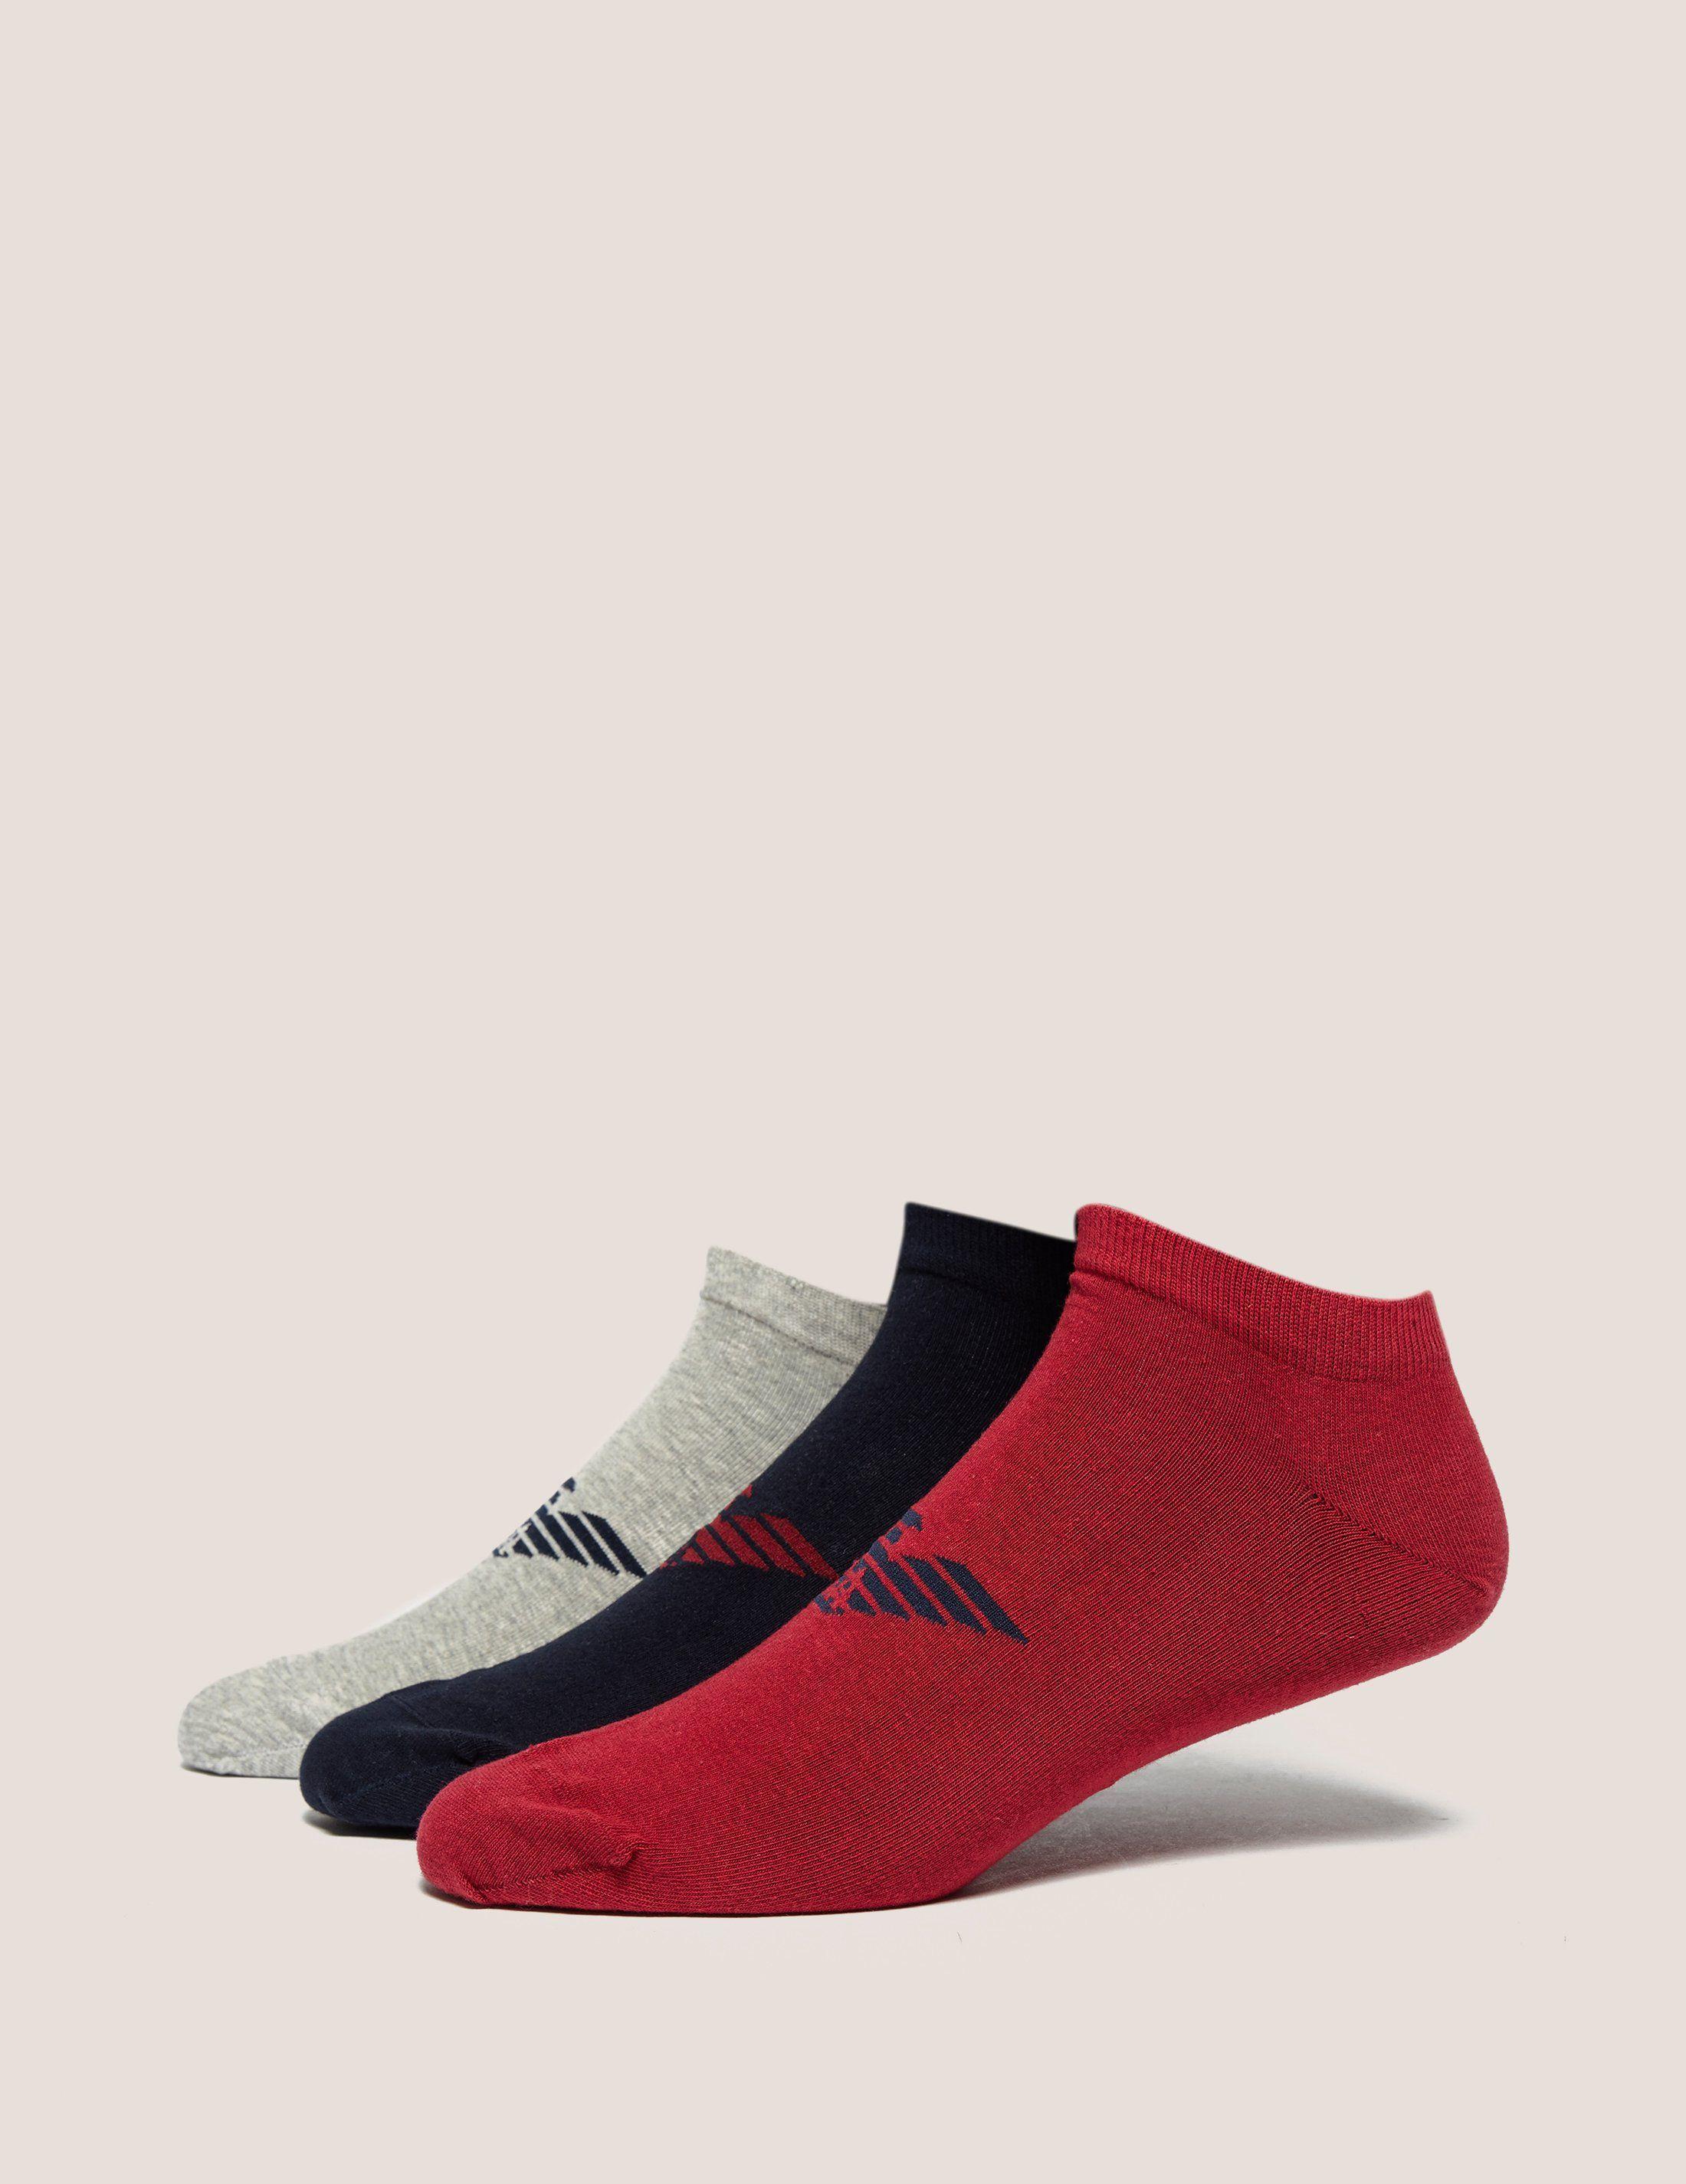 Emporio Armani 3-Pack Training Socks